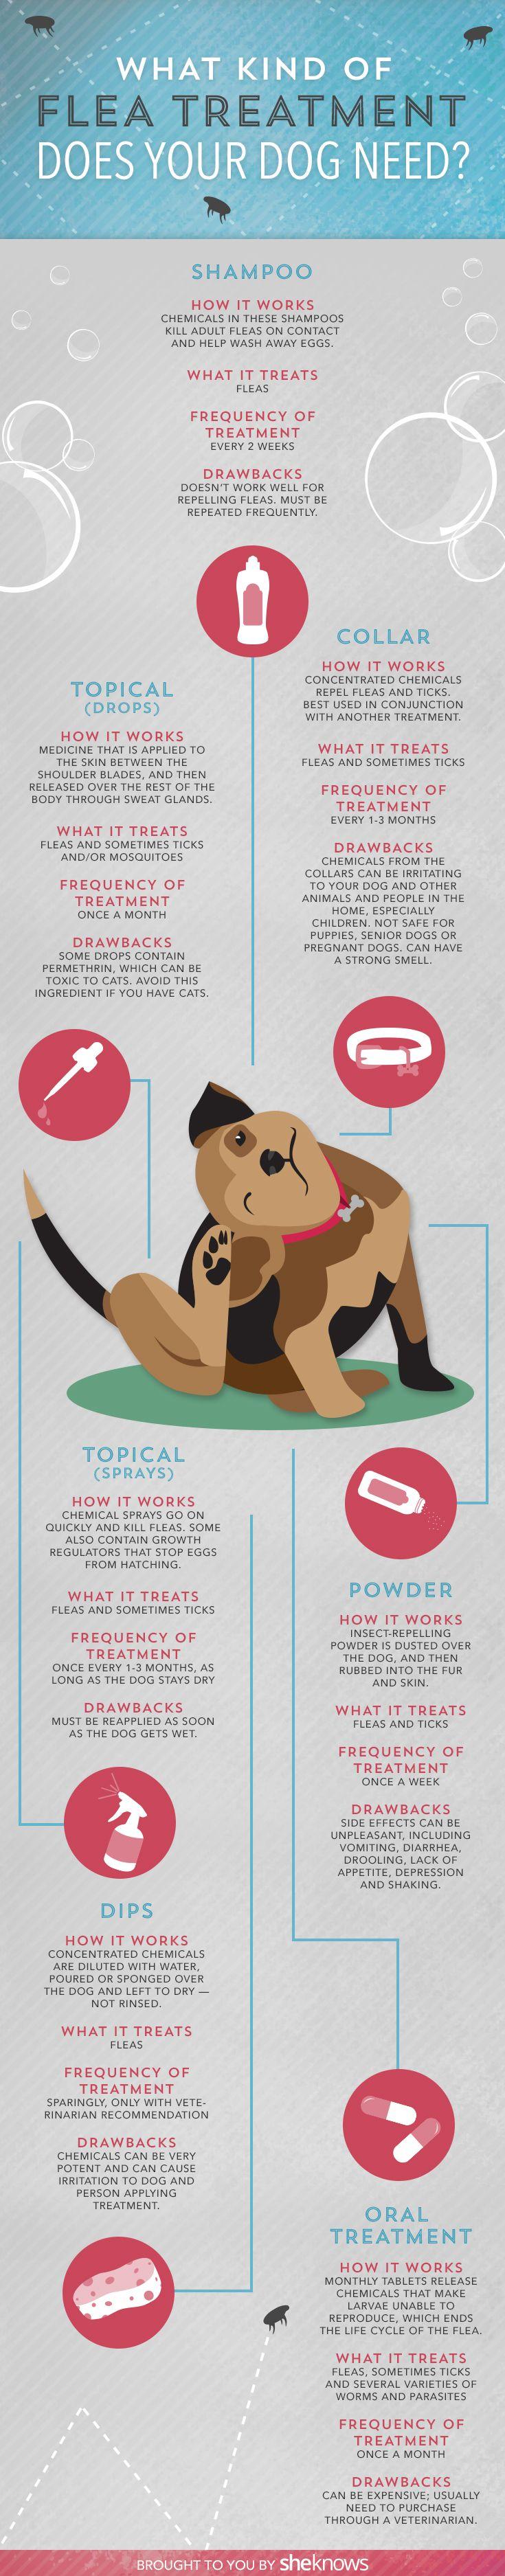 34 best Flea & Tick Prevention images on Pinterest | Pet health ...